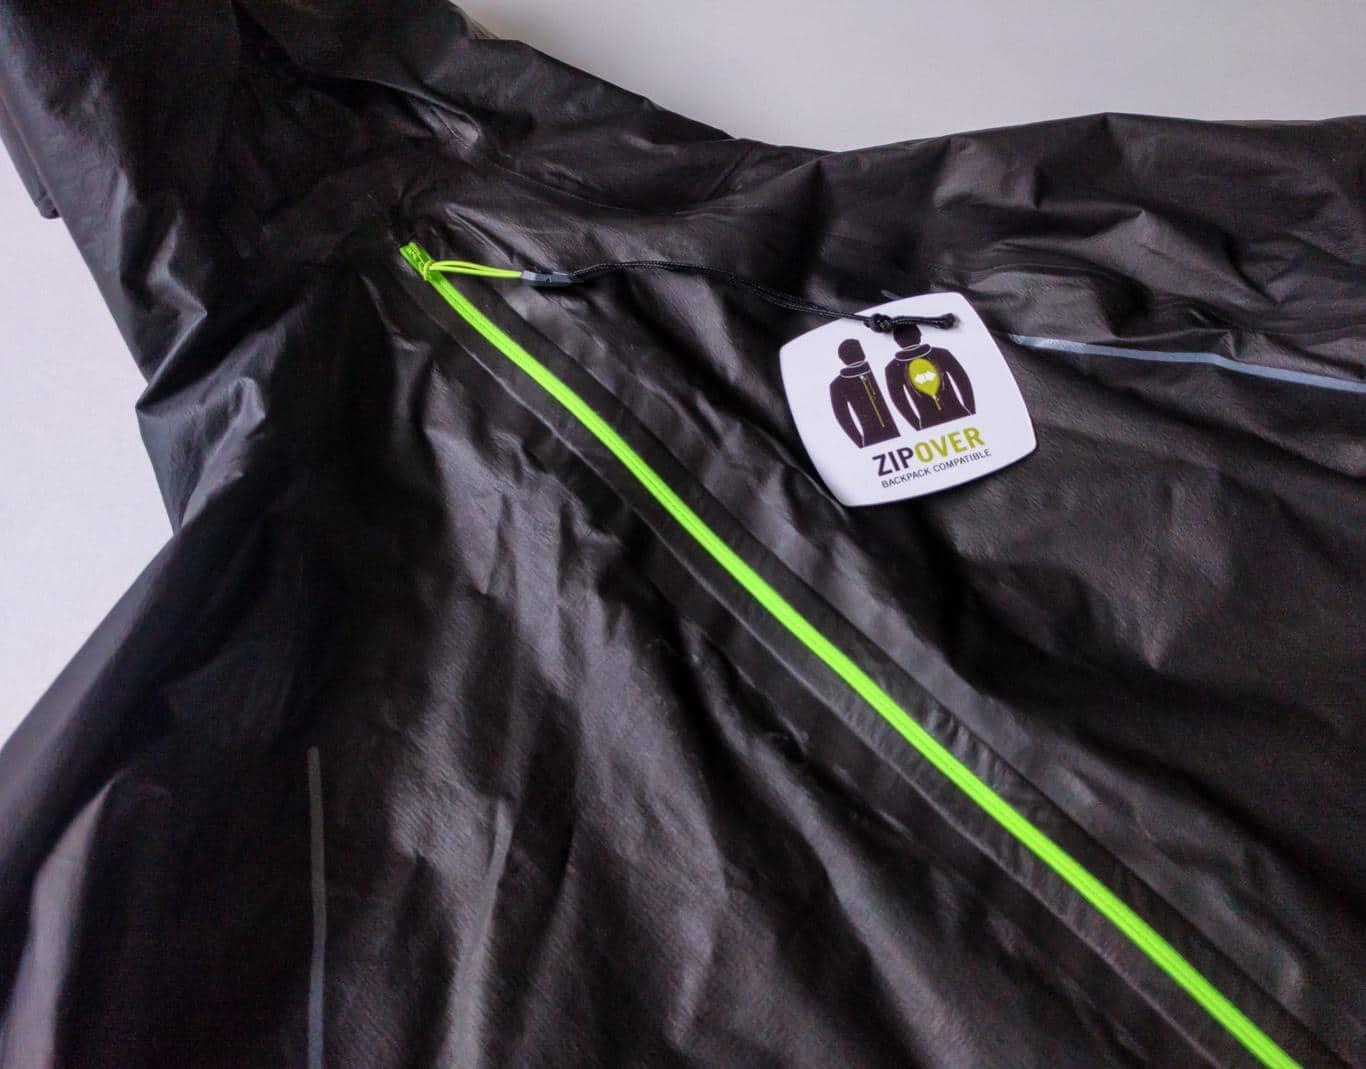 Dynafit ZipOver Backpack System